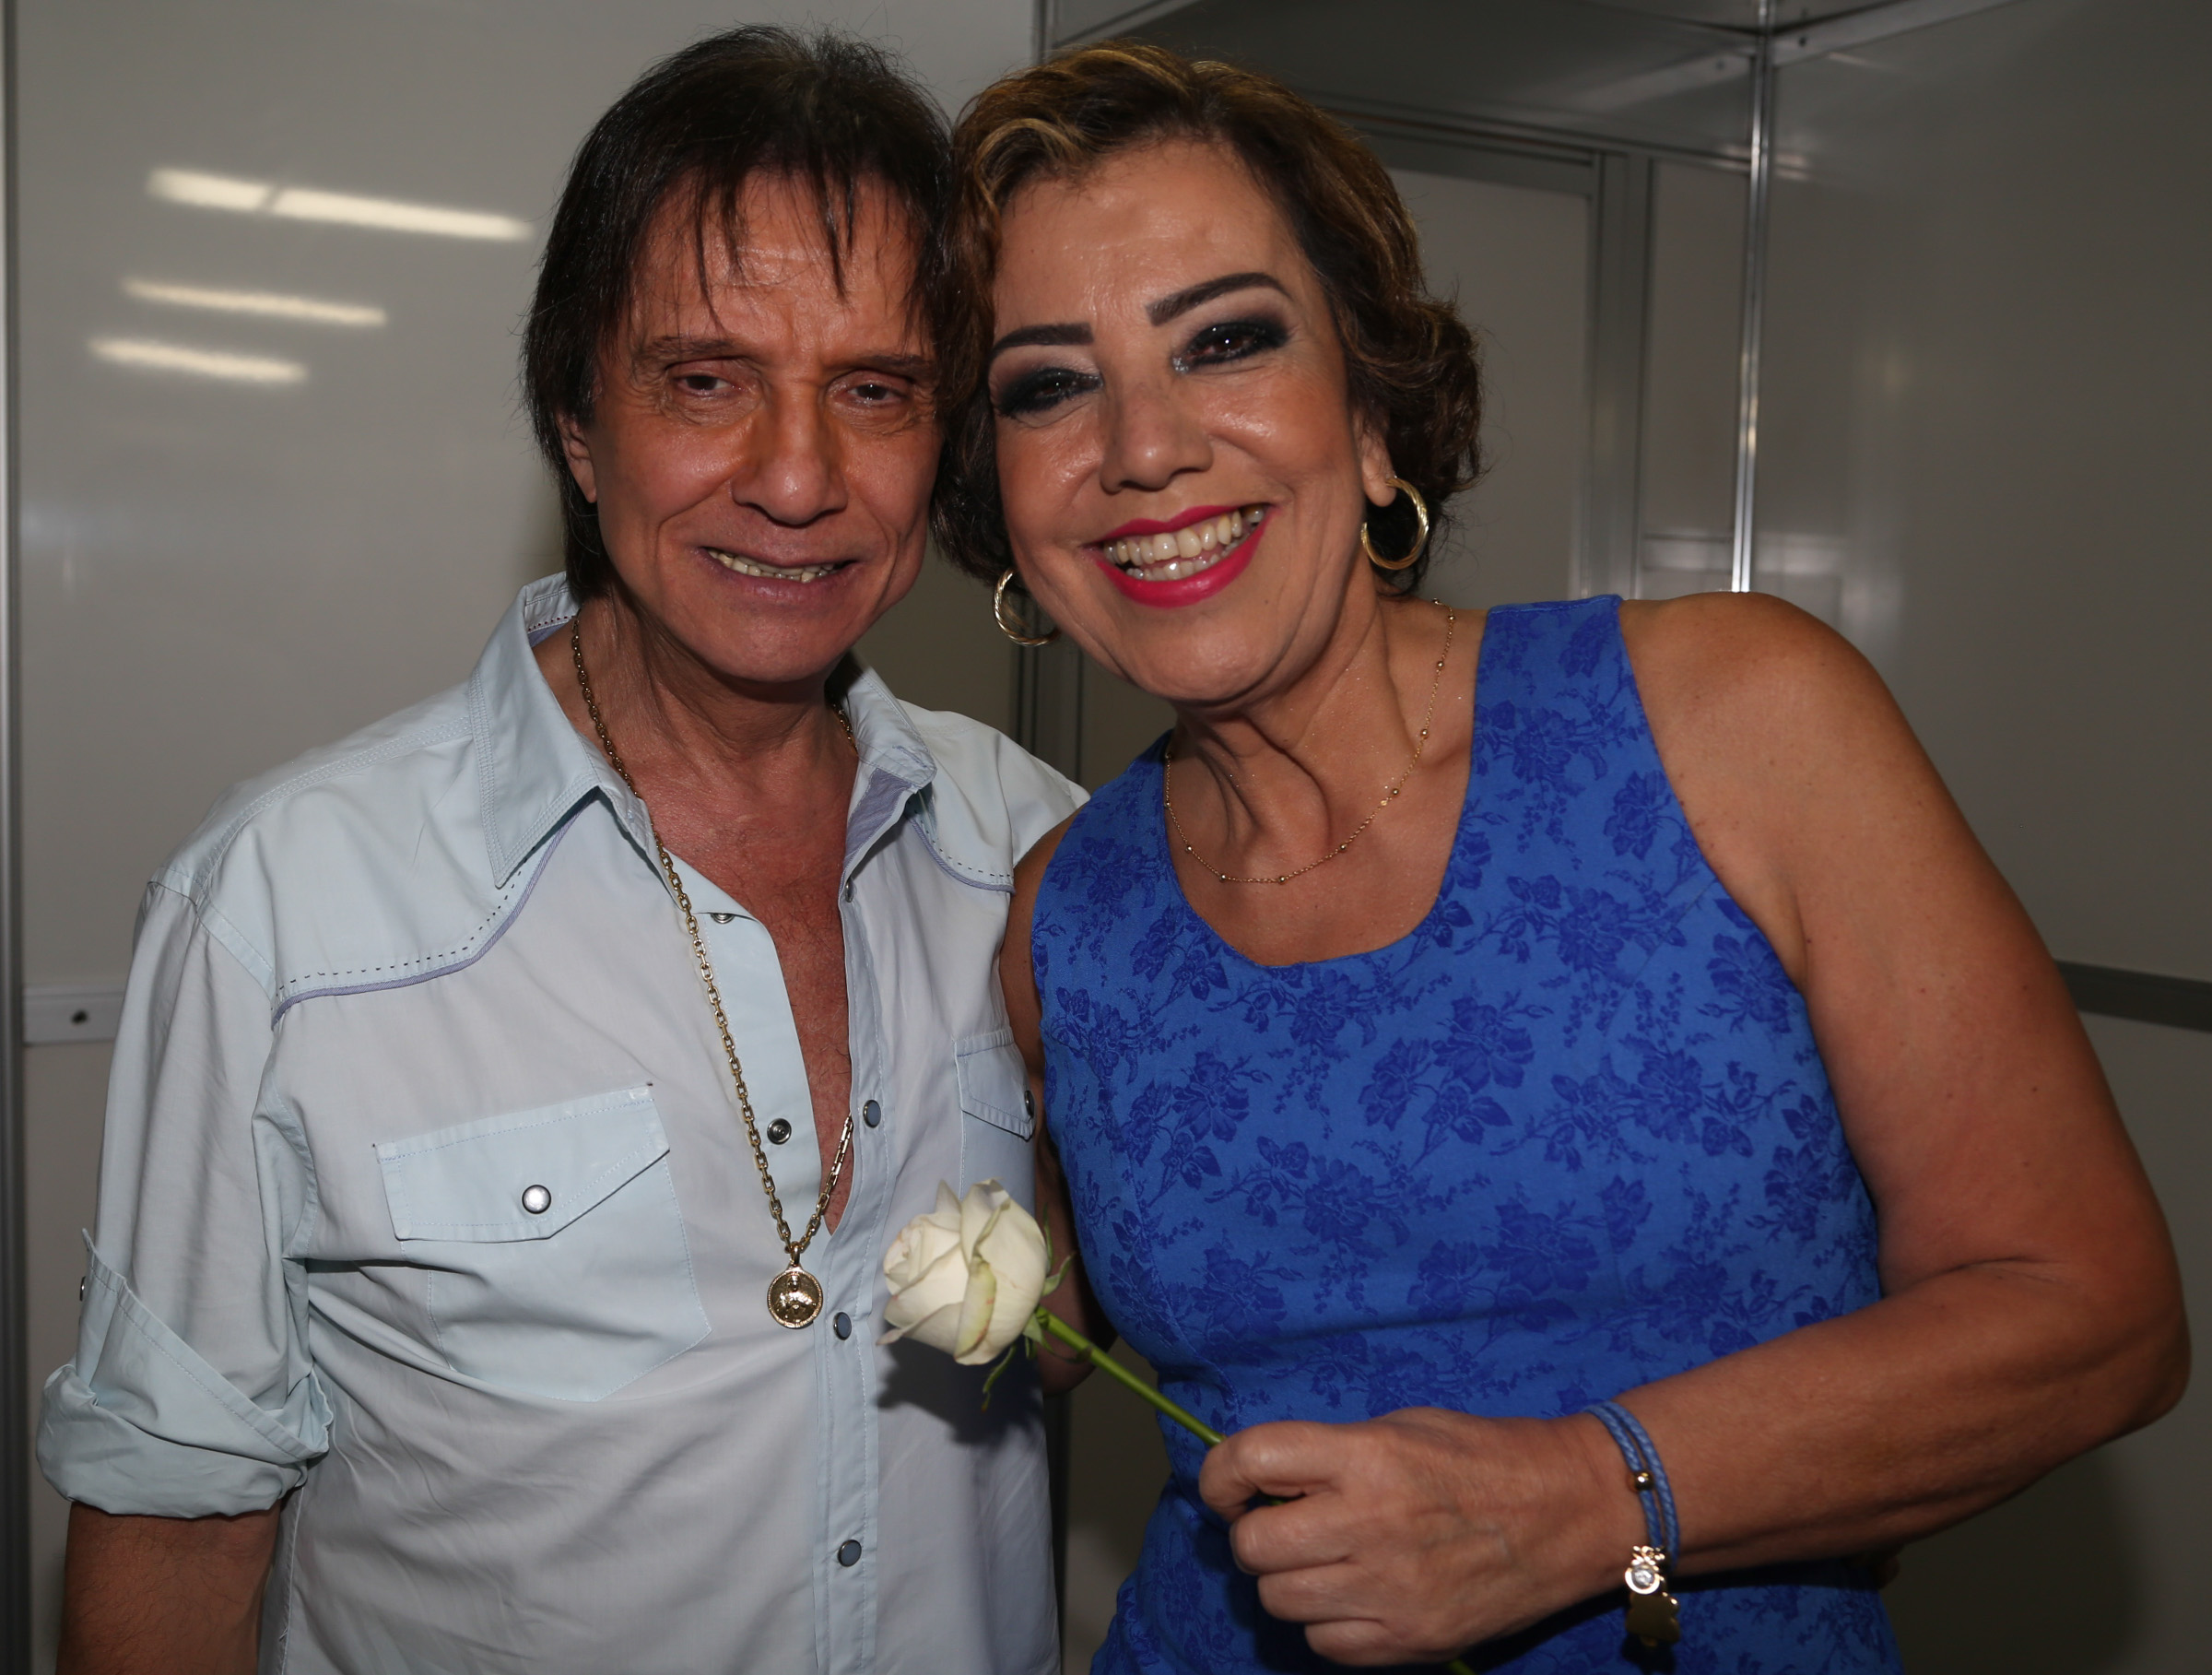 Arlete Elenice Pereira Guedes